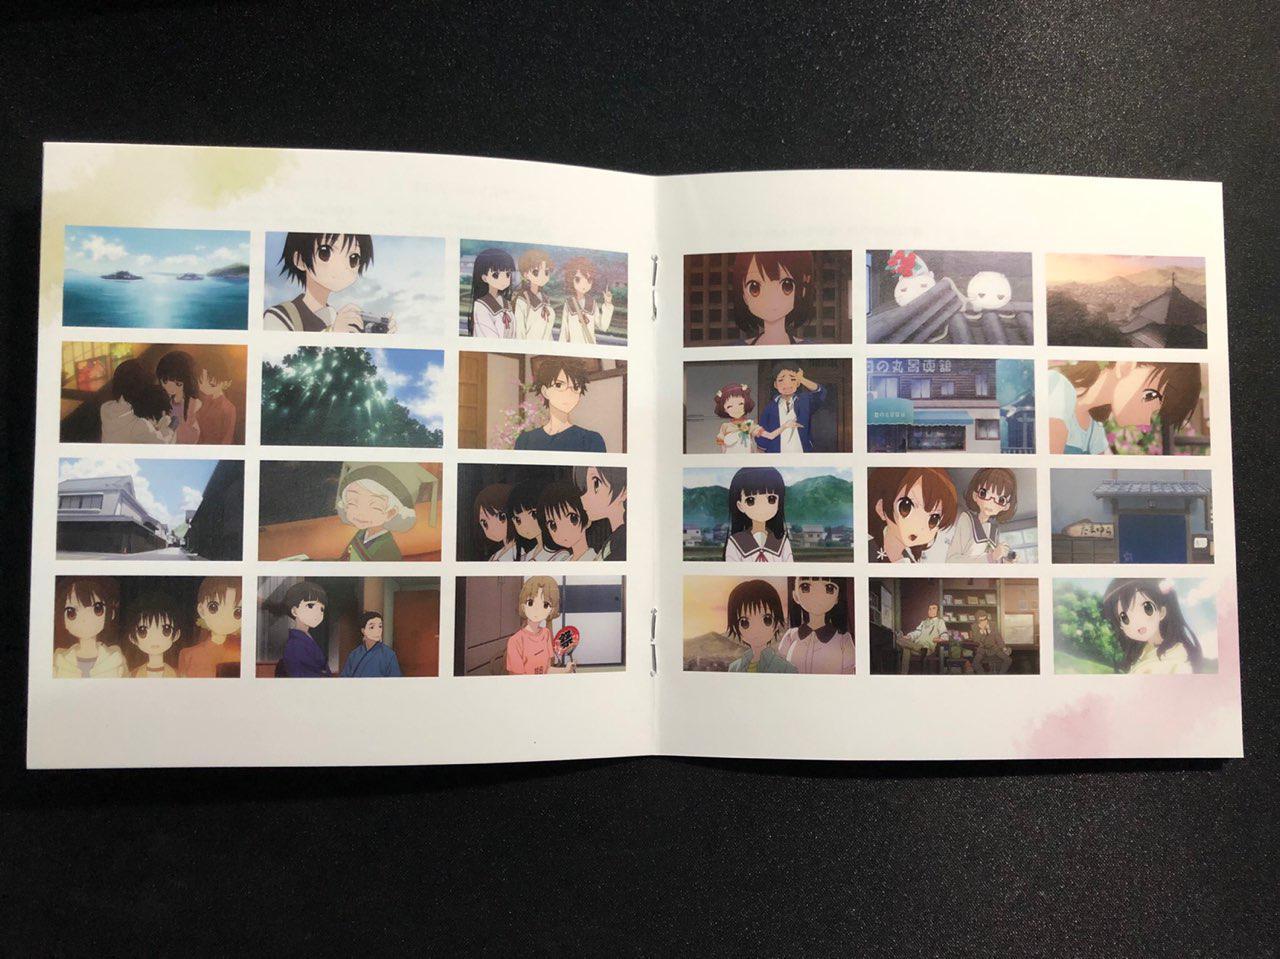 photo_2018-11-21_10-04-51.jpg